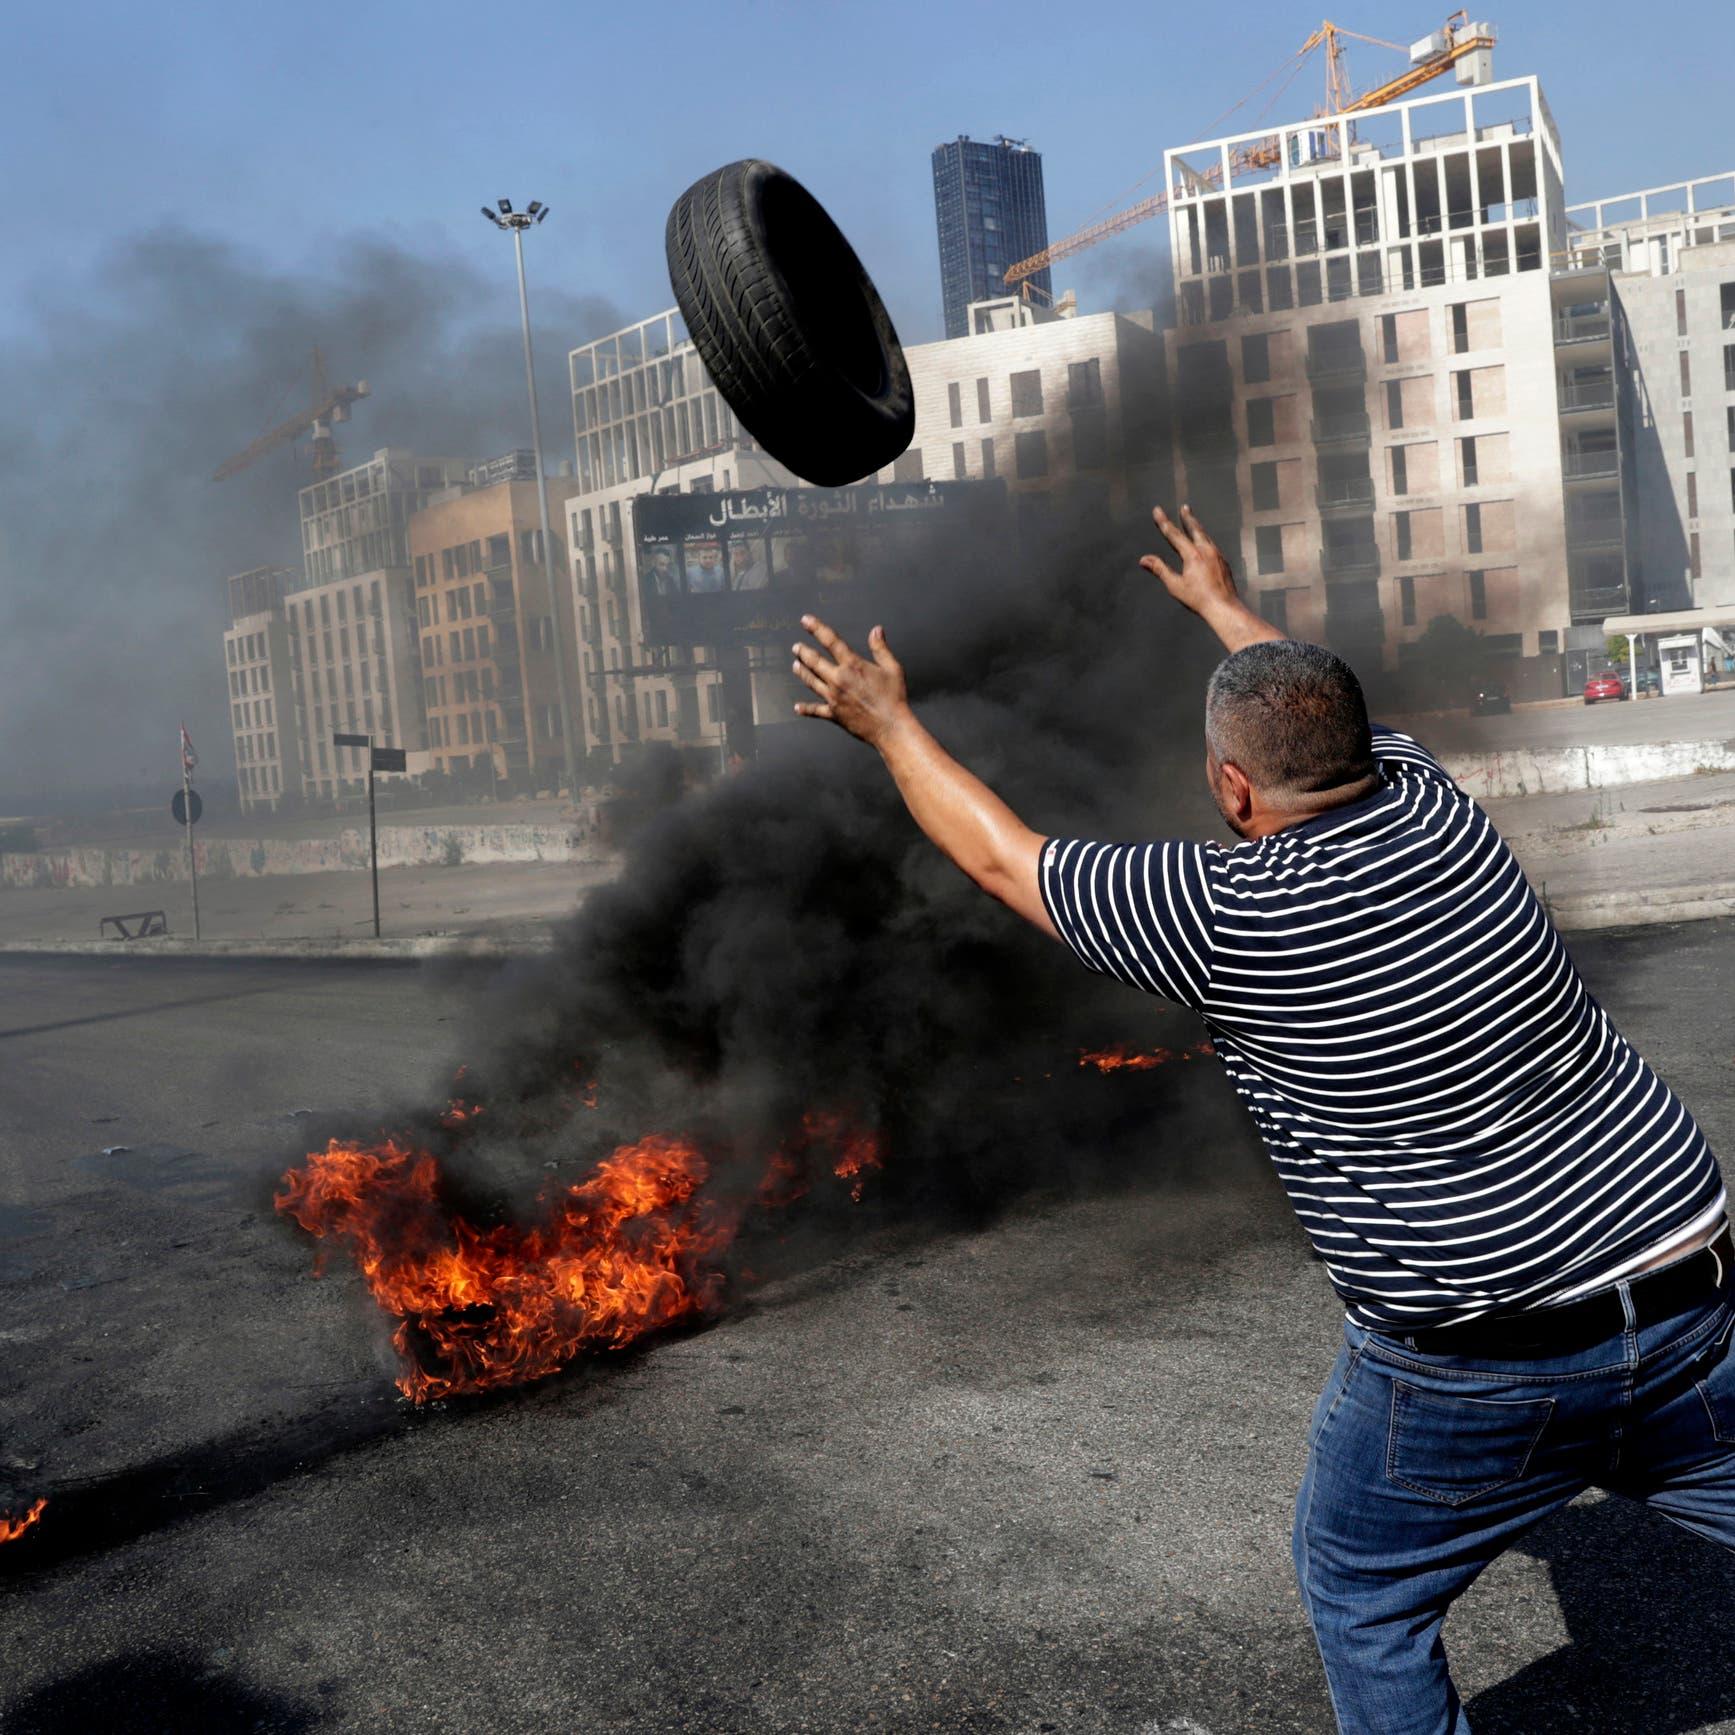 French envoy slams Lebanon PM for shifting blame on economic collapse